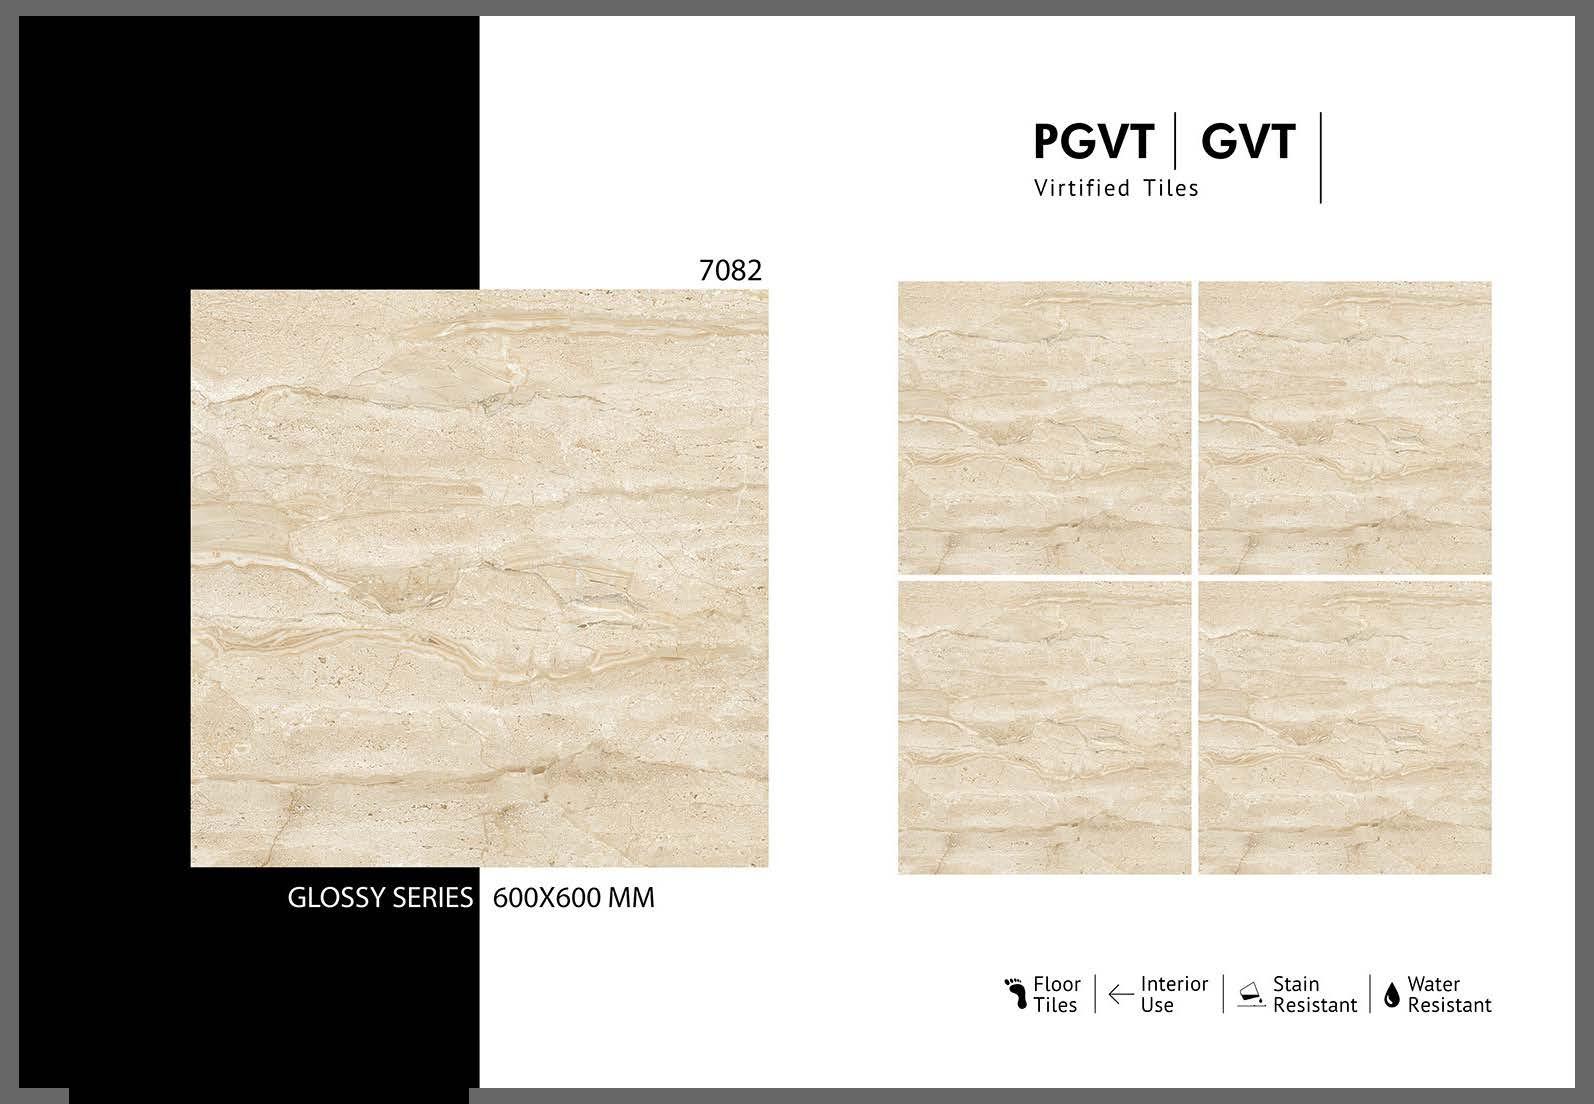 GVT 2X2 GLOSSY_Page_69.jpg